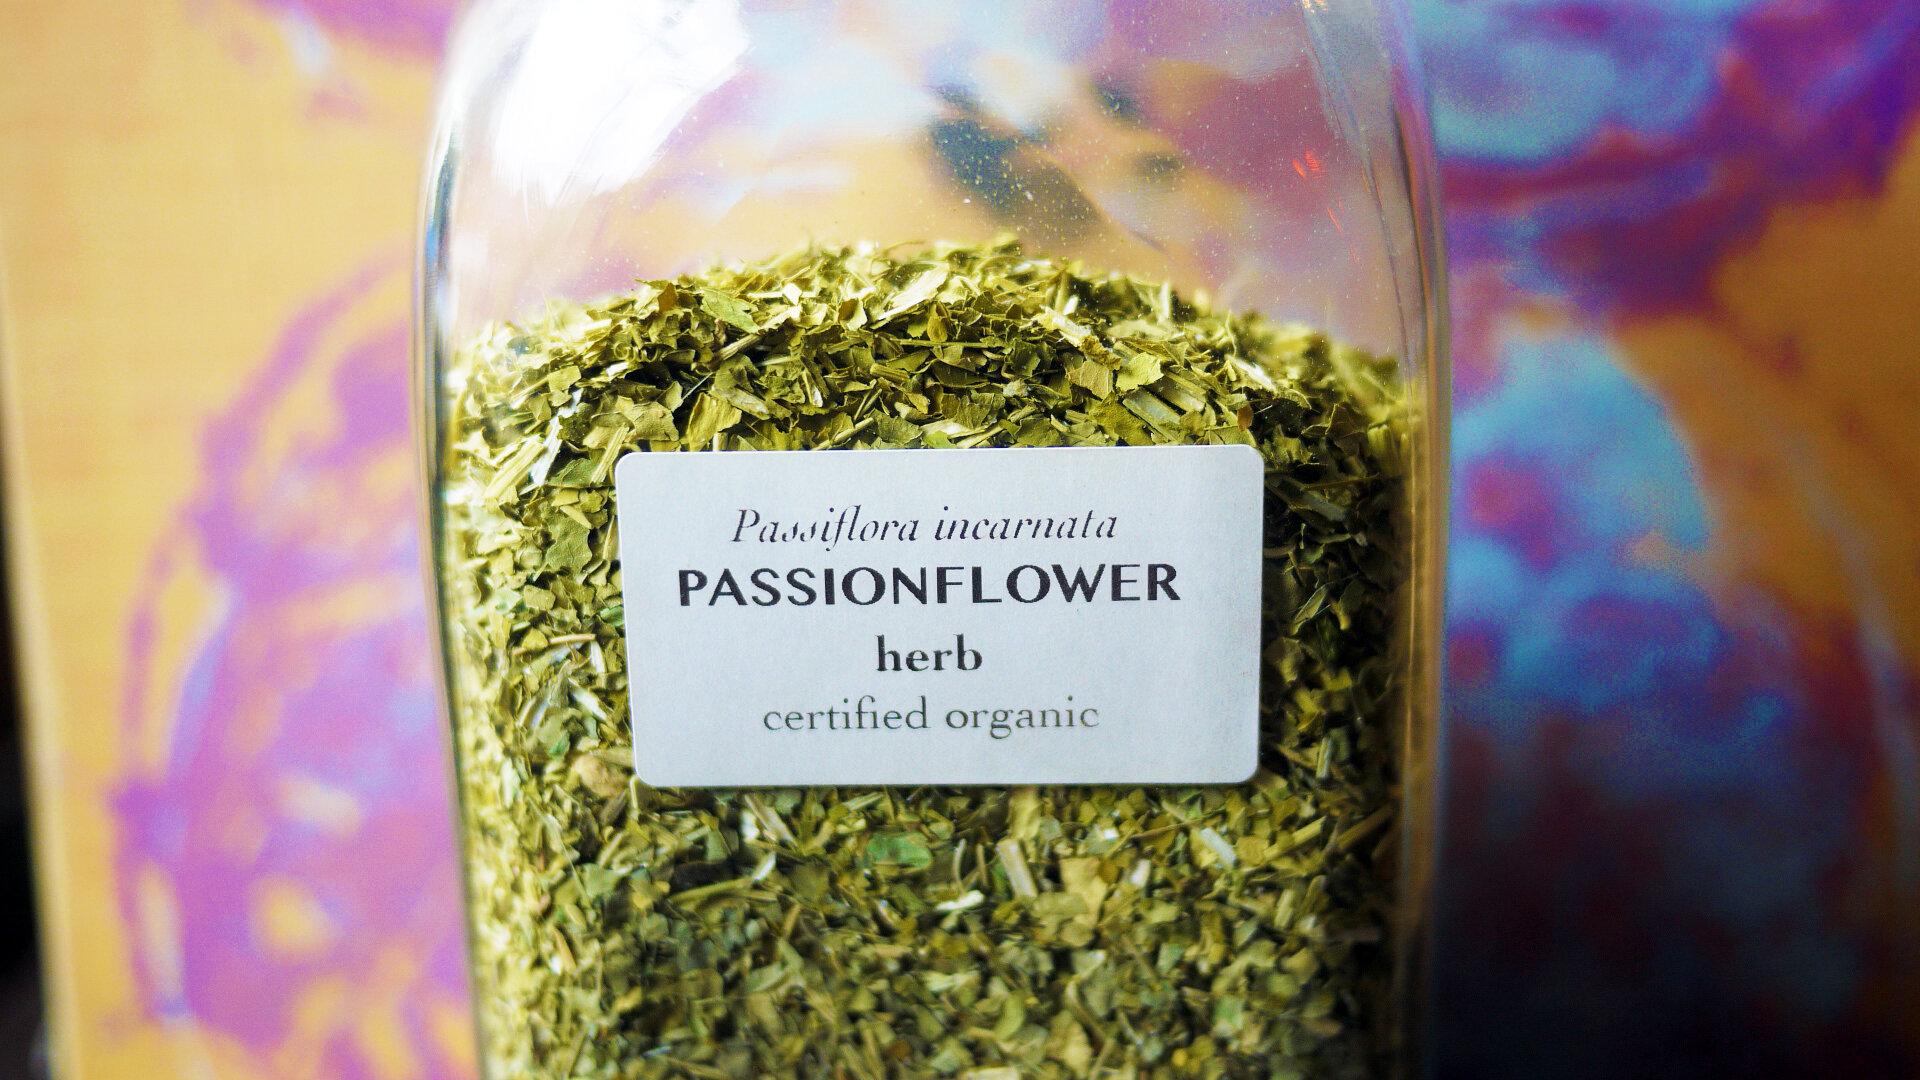 Passionflowerherb.jpg